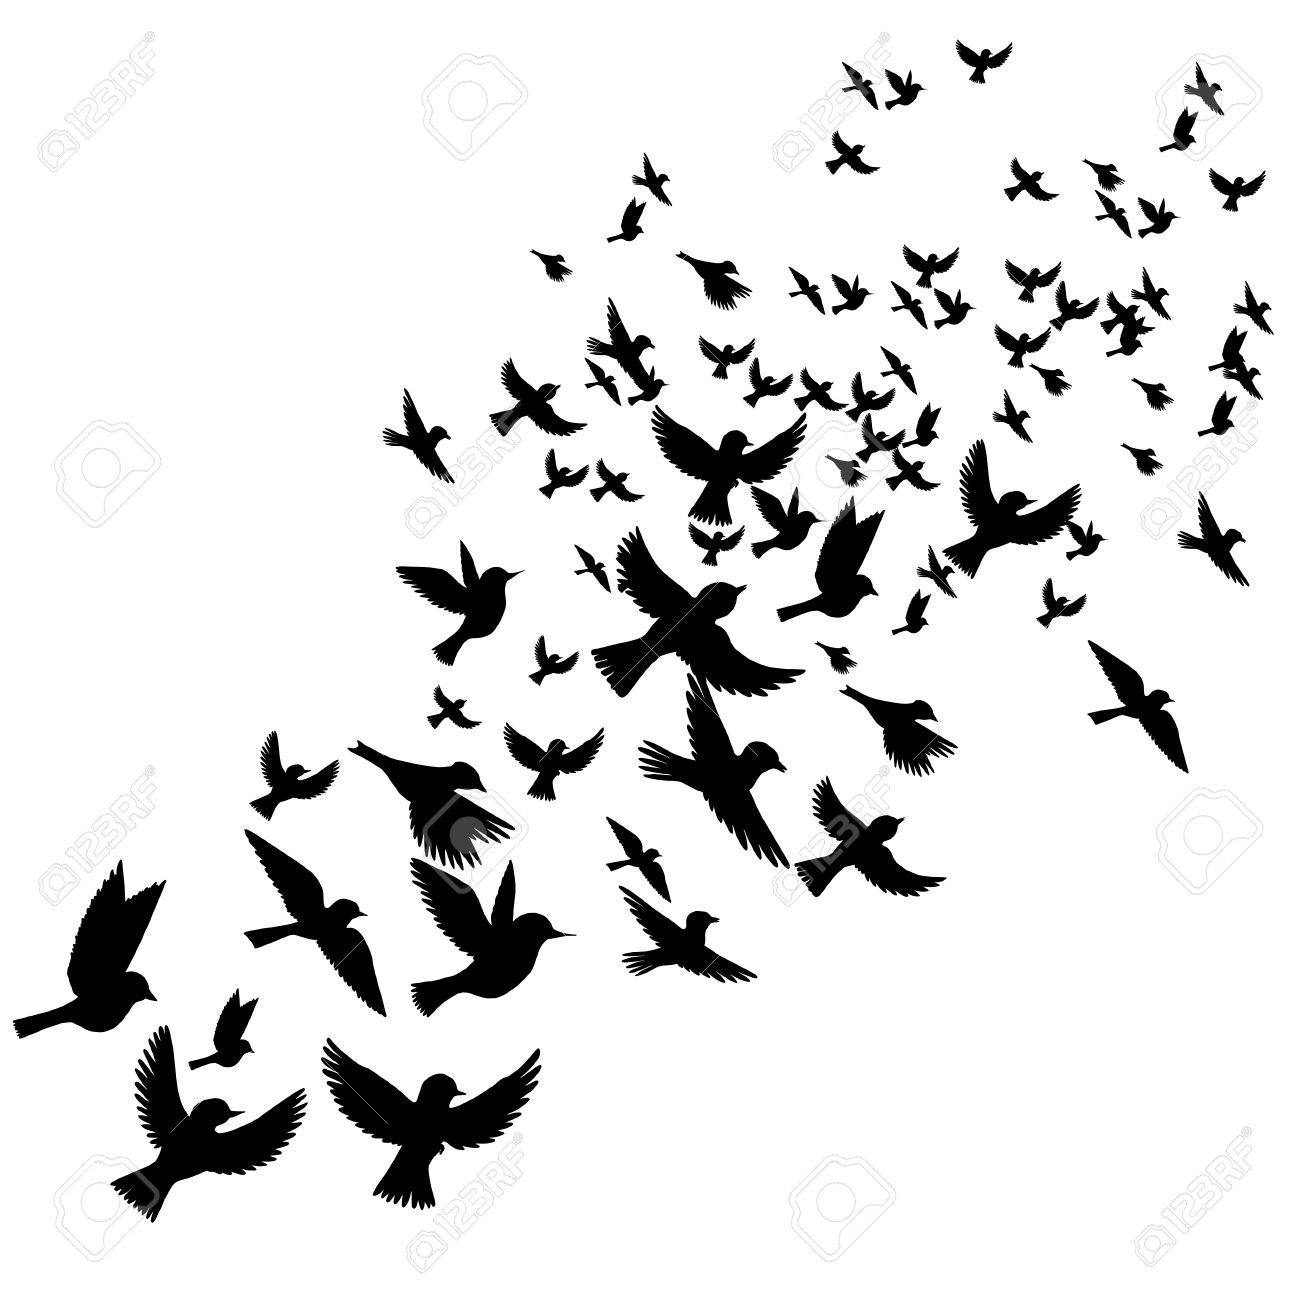 Bird flock, vector flying birds silhouettes, hand drawn songbirds Stock  Vector - 75011021